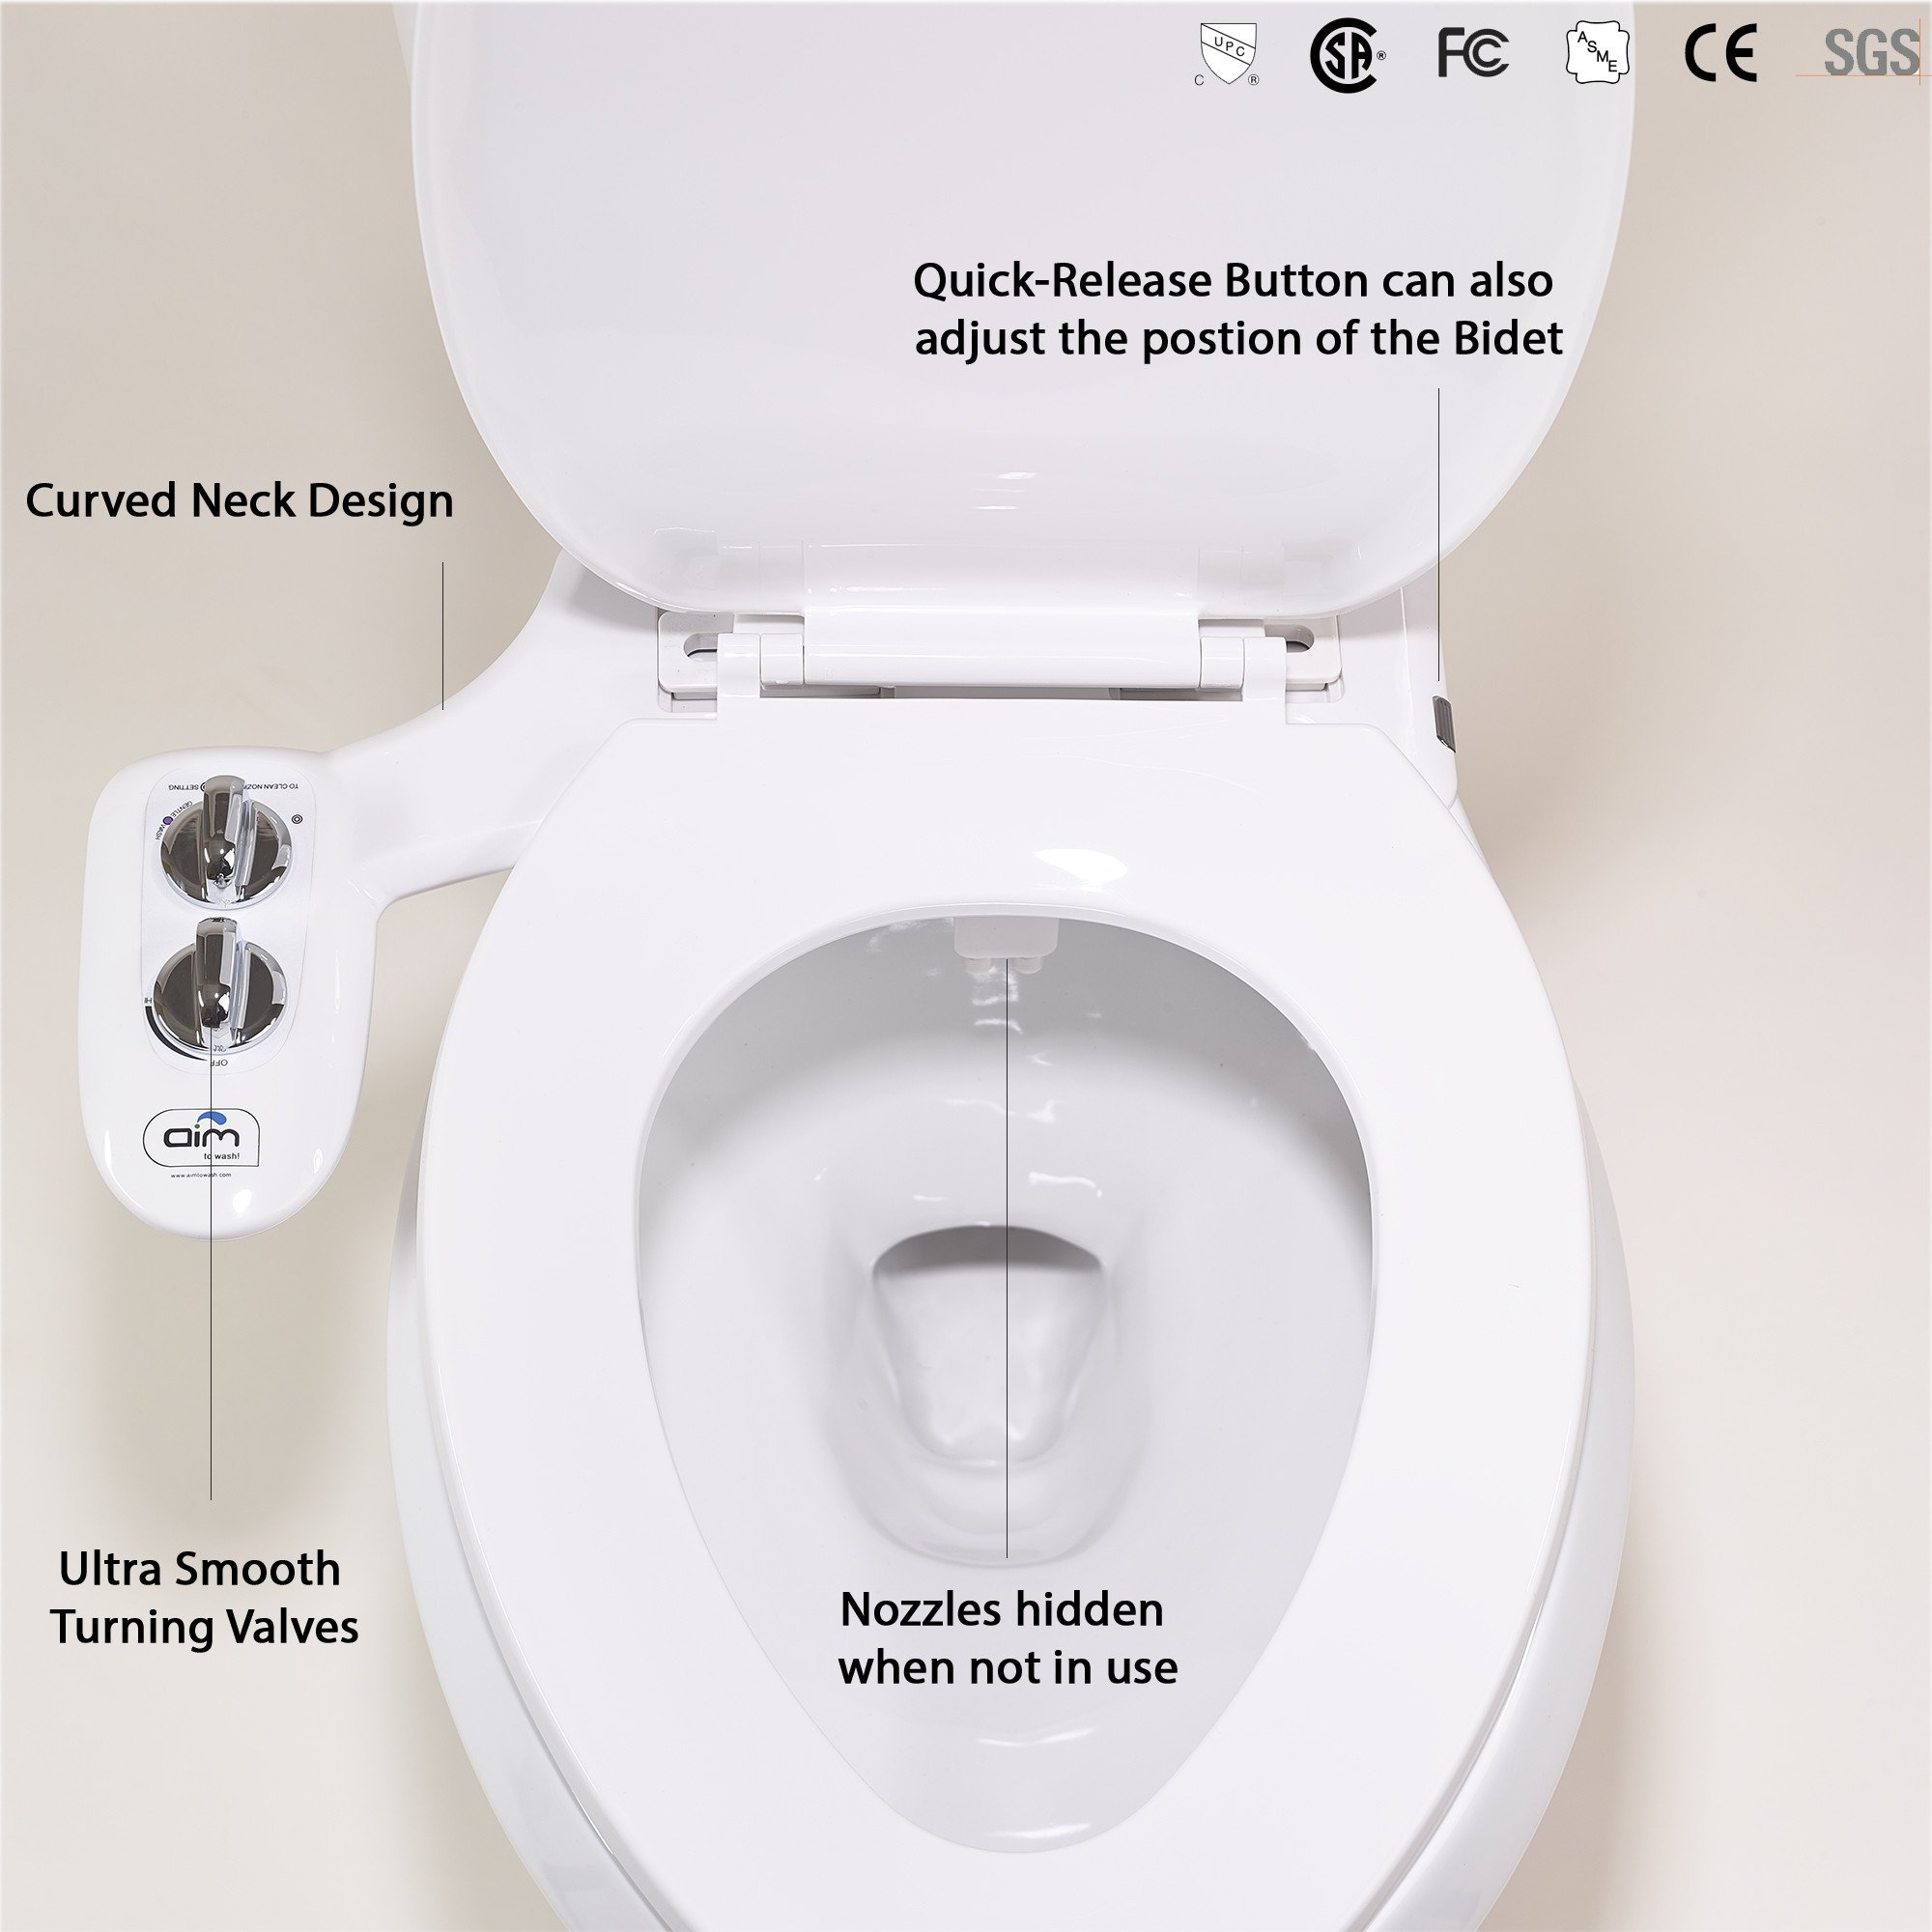 Bidet Attachment + Toilet Night Light + Quick Release